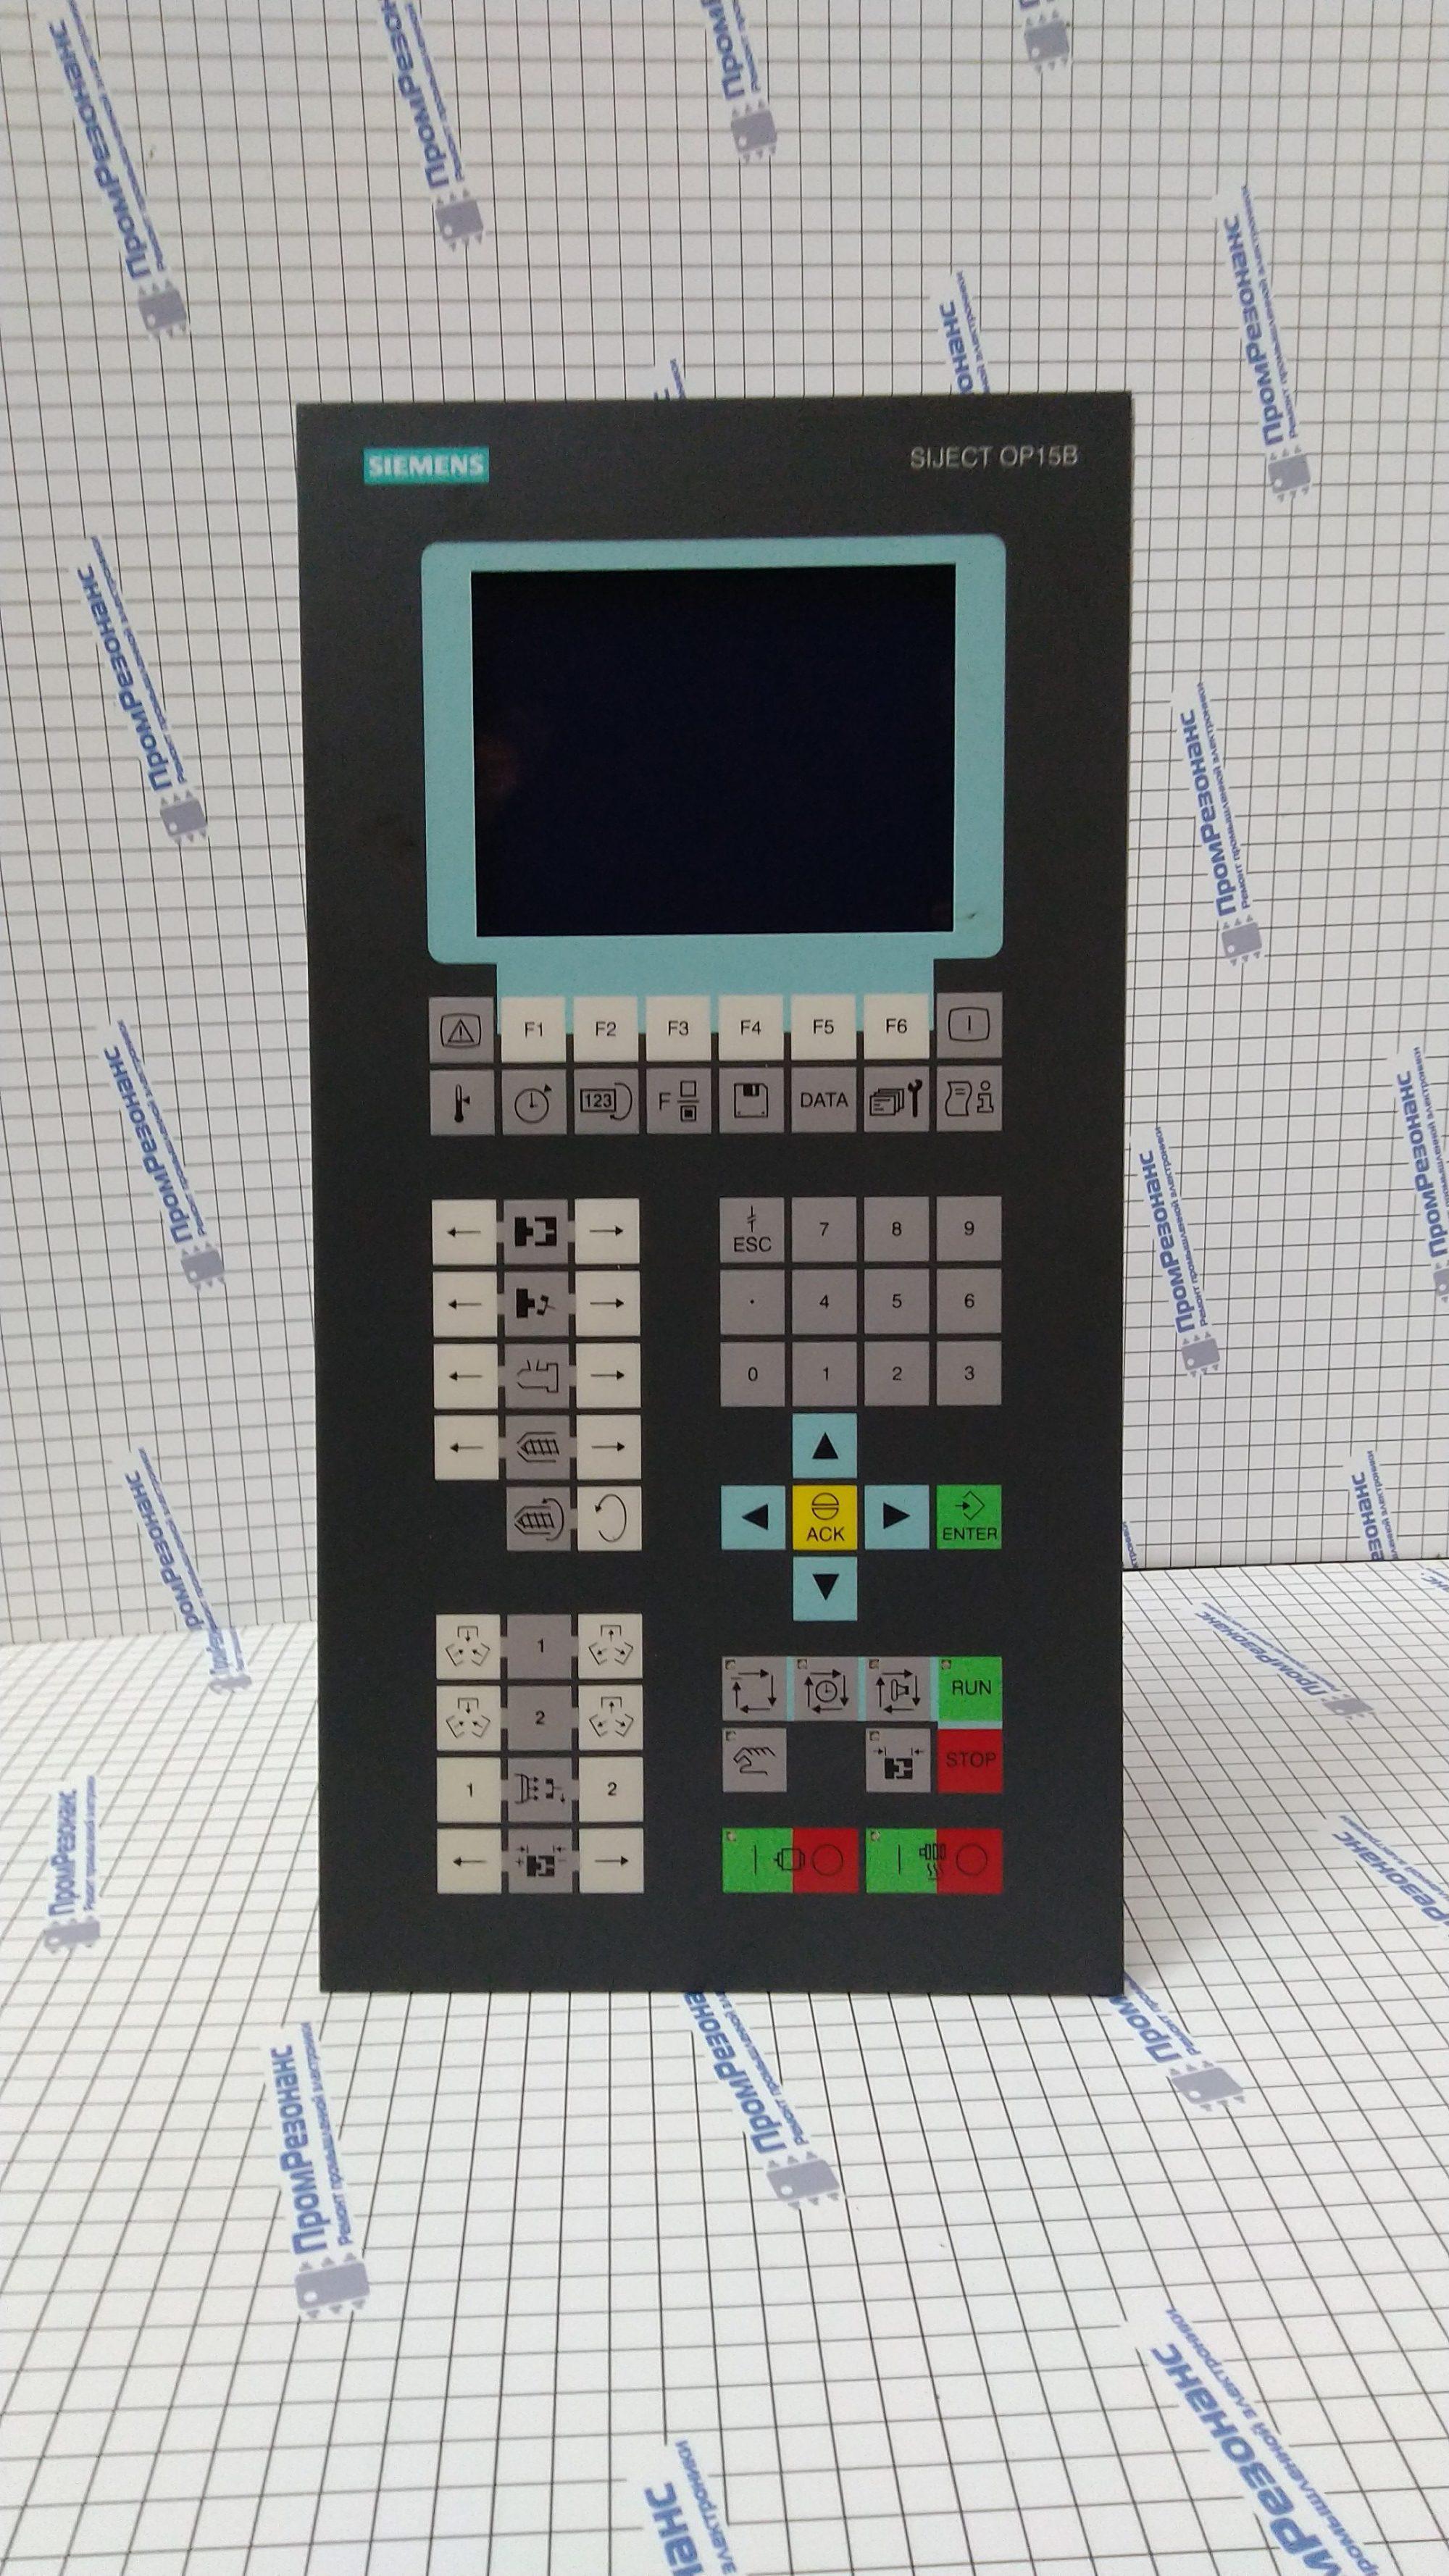 Сенсорная панель оператора Siemens Siject OP15B 6at1131-5bb20-0xb0